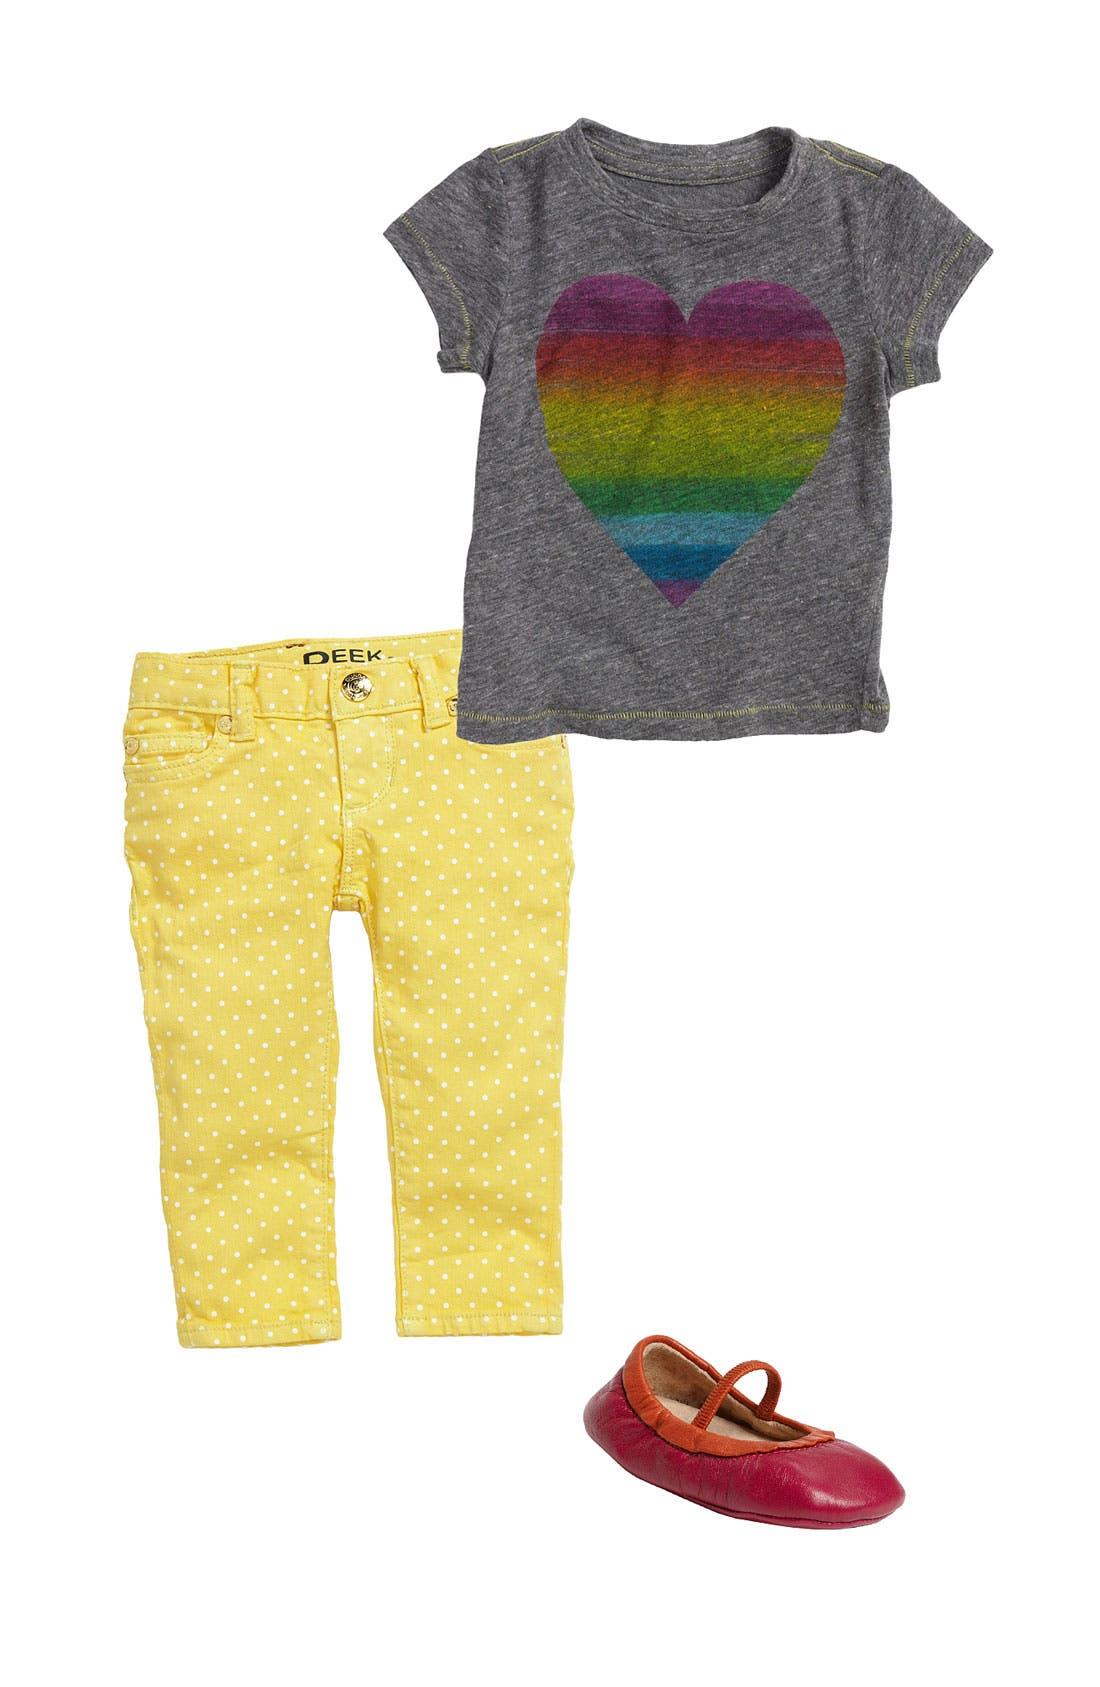 Main Image - Peek Tee, Skinny Jeans & Crib Shoe (Infant)